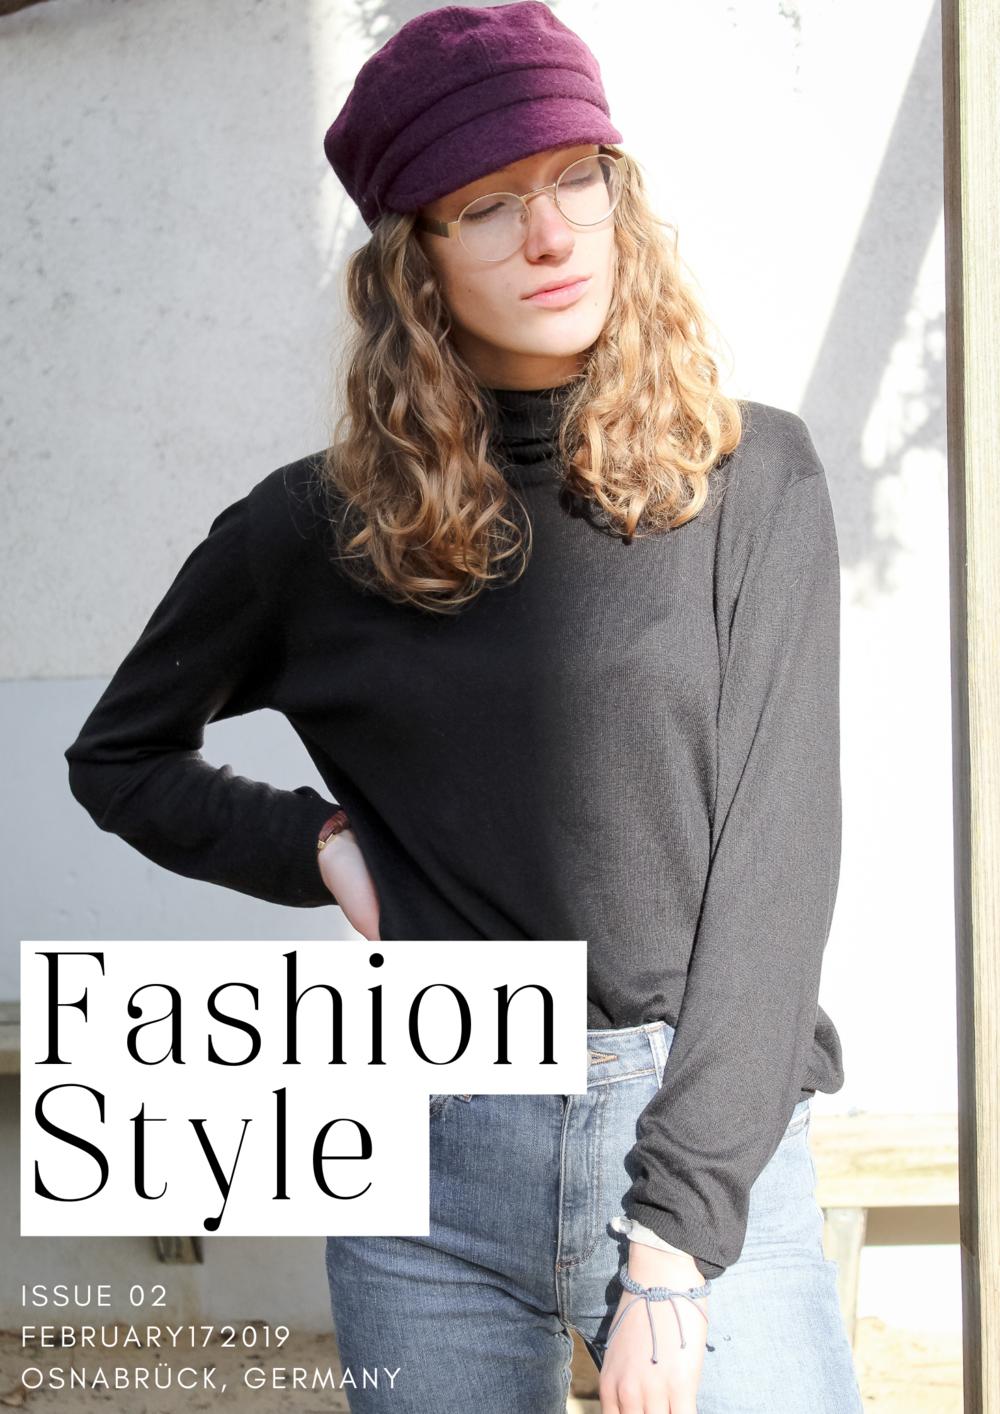 Fashion Style Outfit from lena.naeht photographed by www.herprettybravesoul.com Osnabrück, Germany, Fashion Style, Nachhaltig, Slow Fashion, editorial, editorial magazine, photography